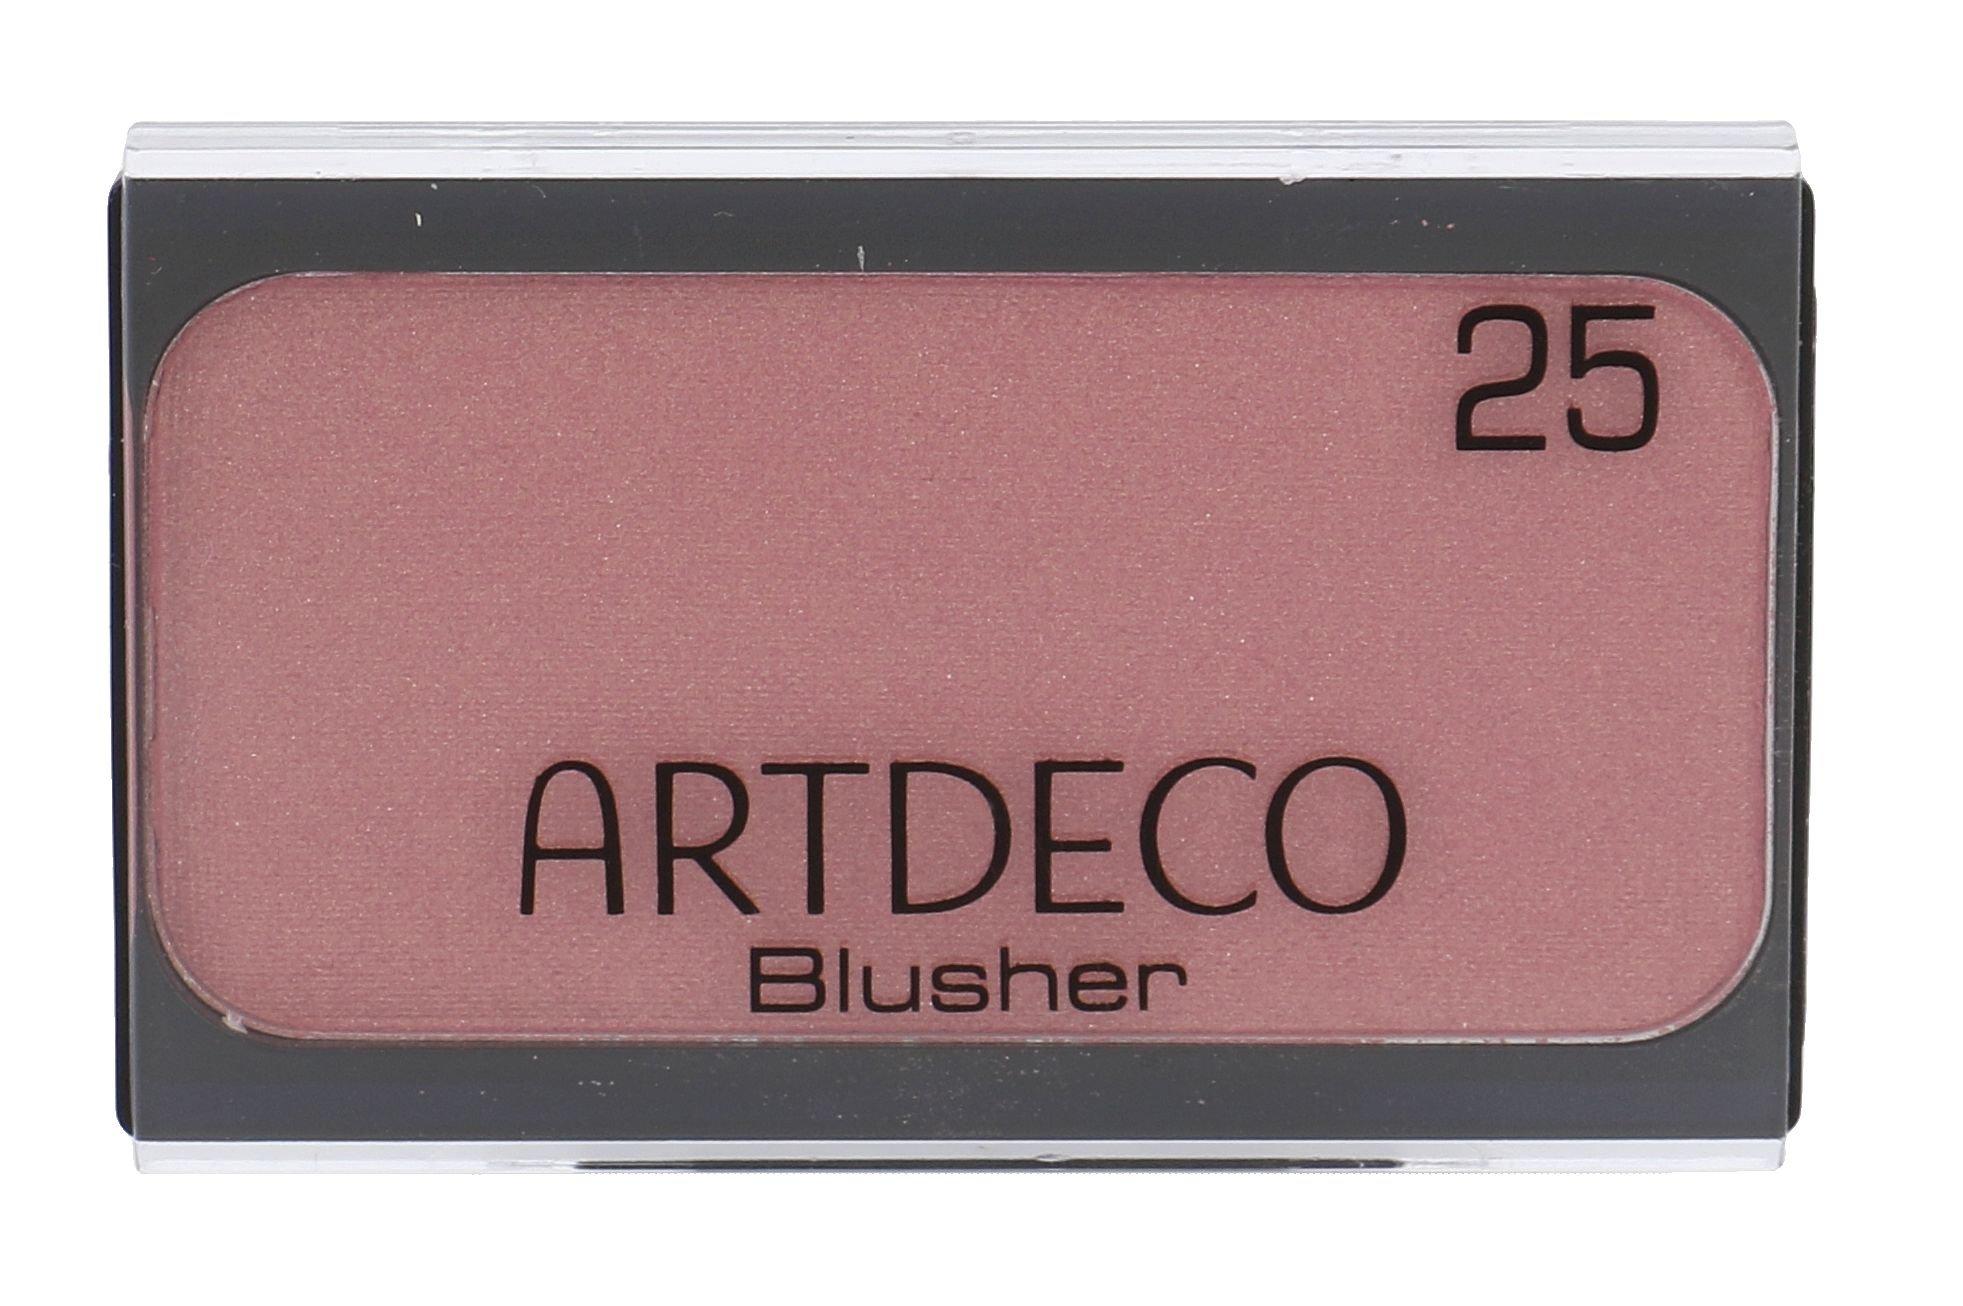 Artdeco Blusher Blush 5ml 25 Cadmium Red Blush